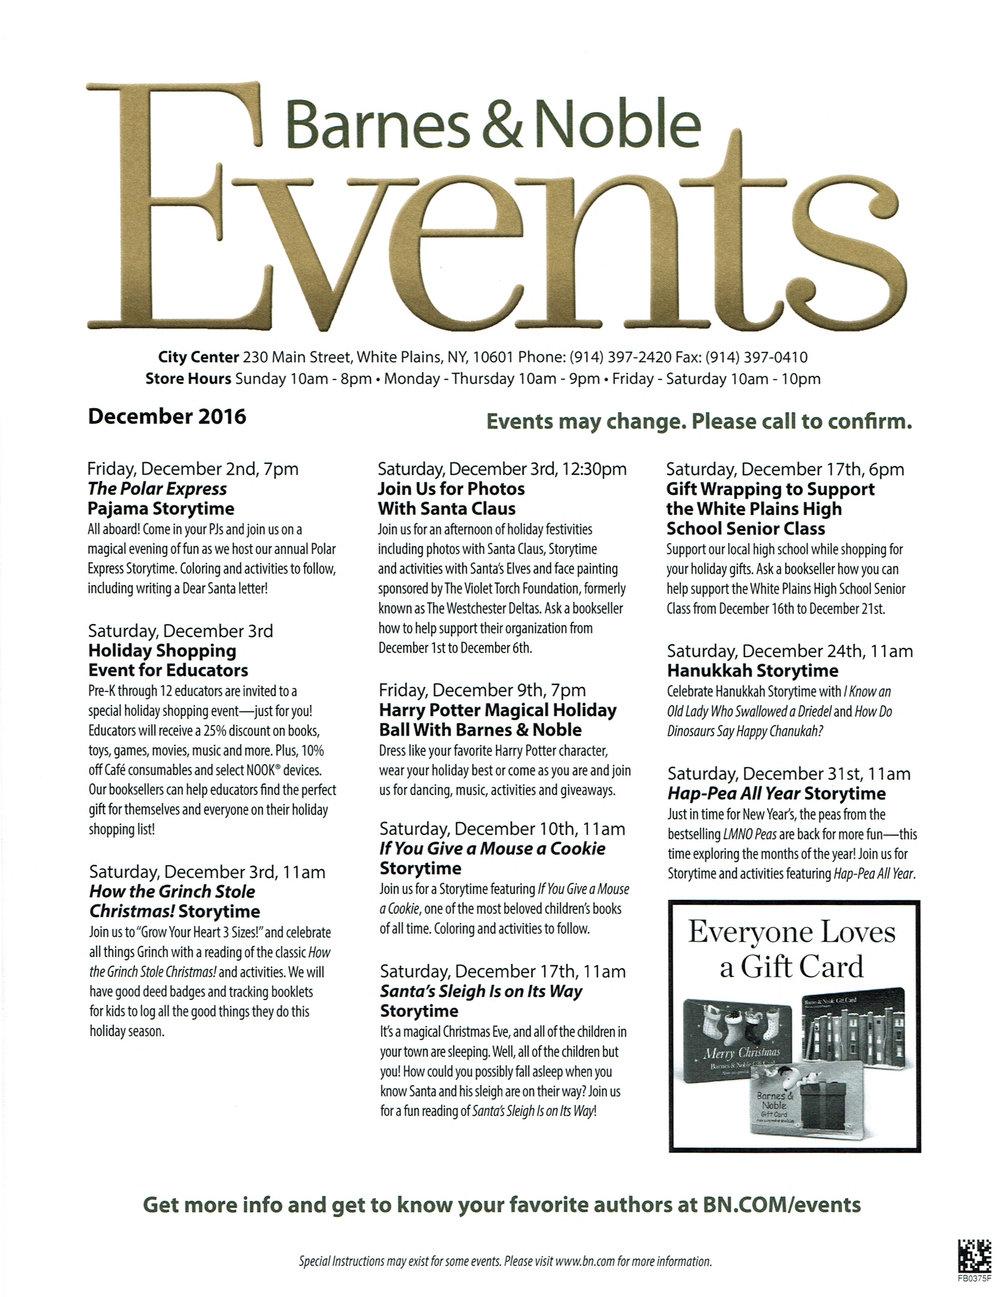 Barnes & Noble December Events — City Center